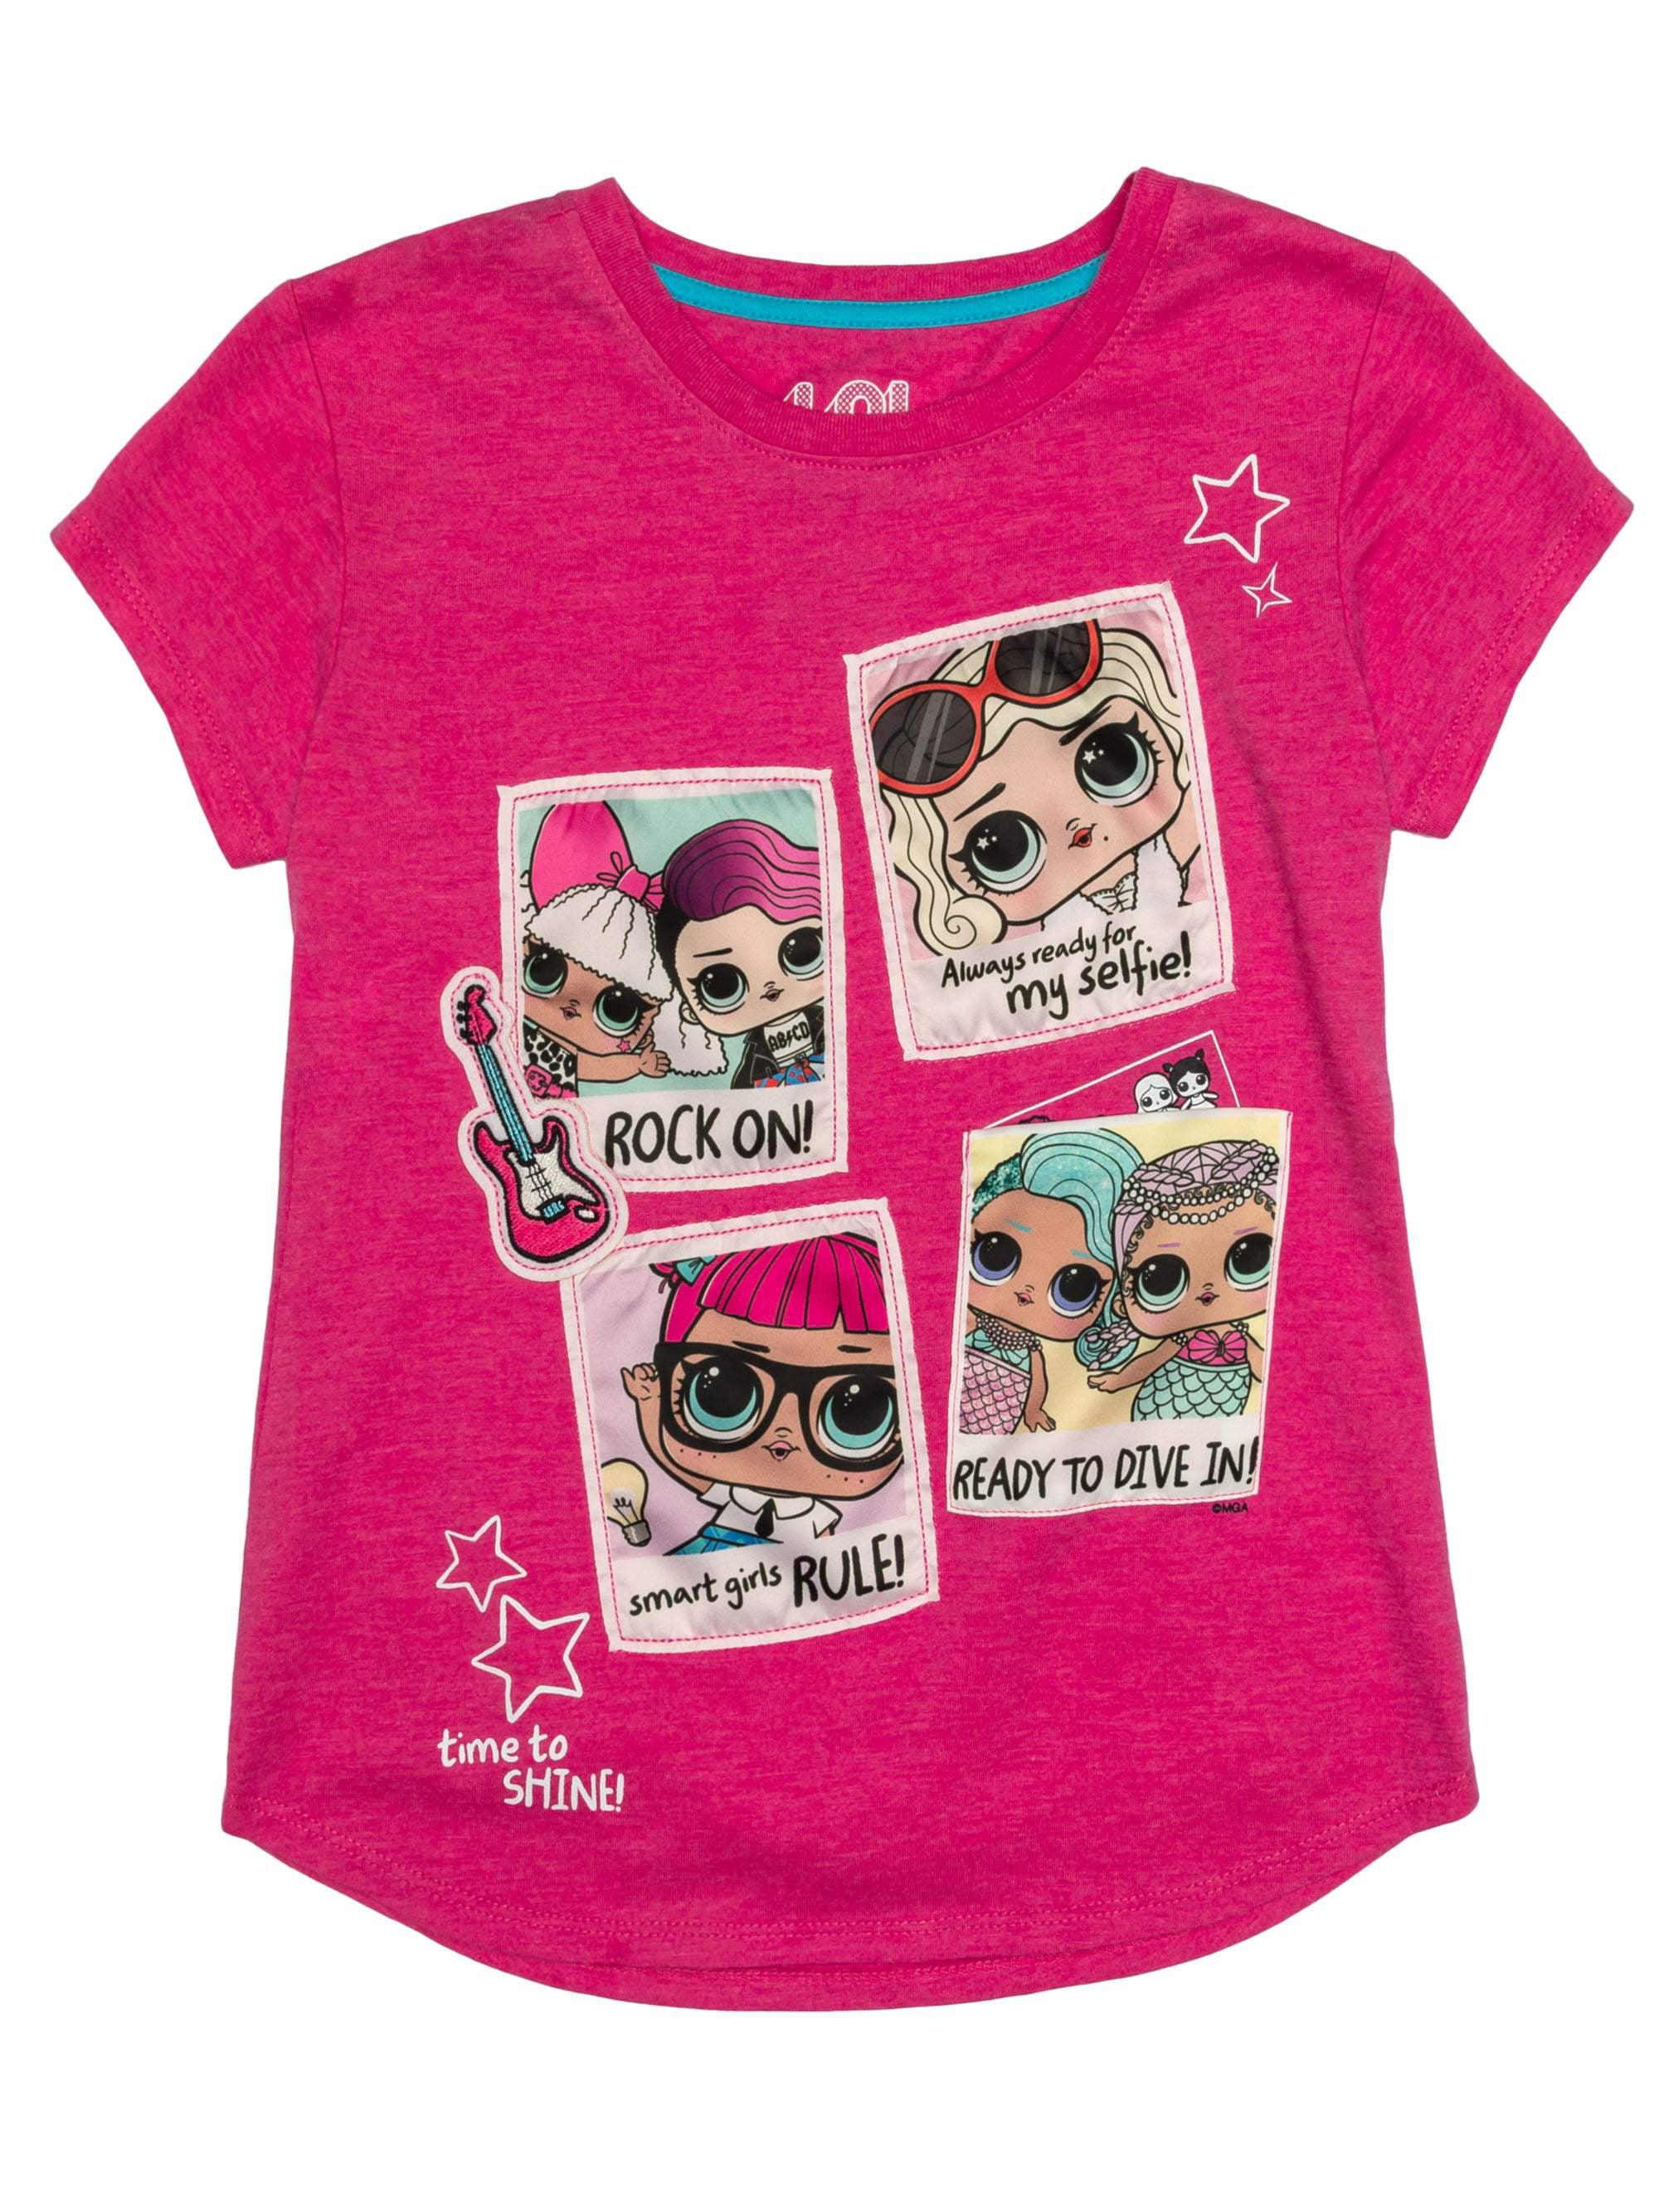 Vaccinated Vers Versatile Graphic T shirt